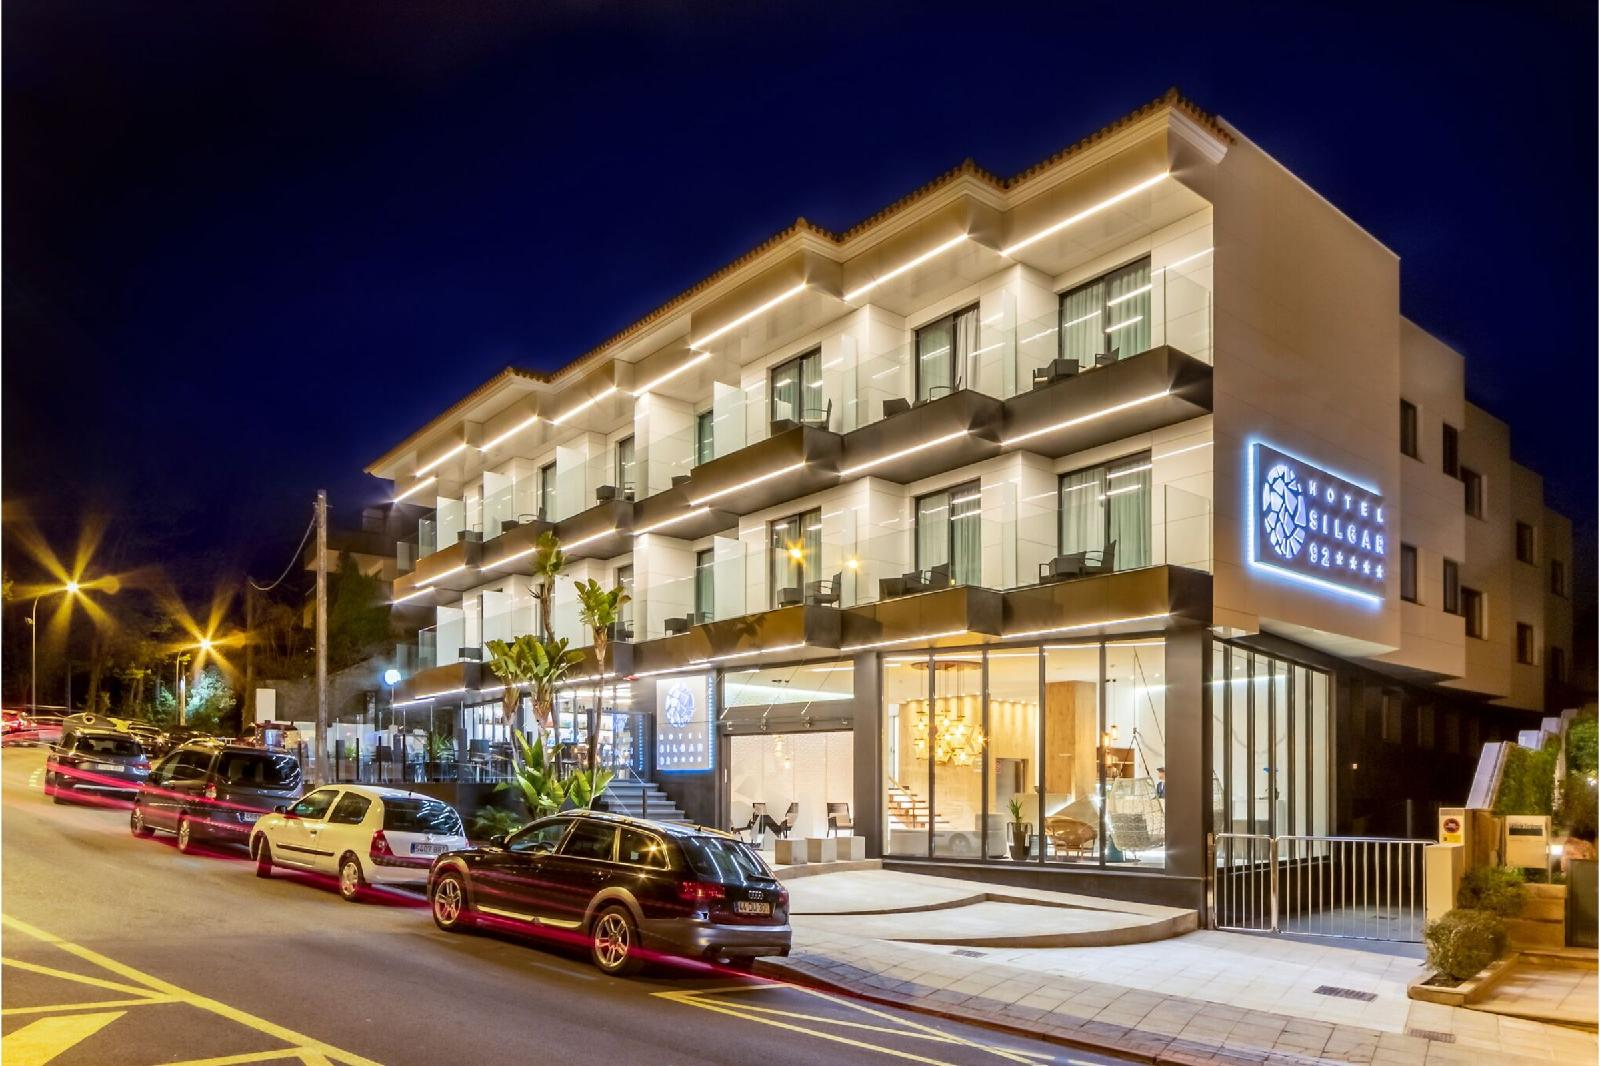 1. Hotel Silgar 92